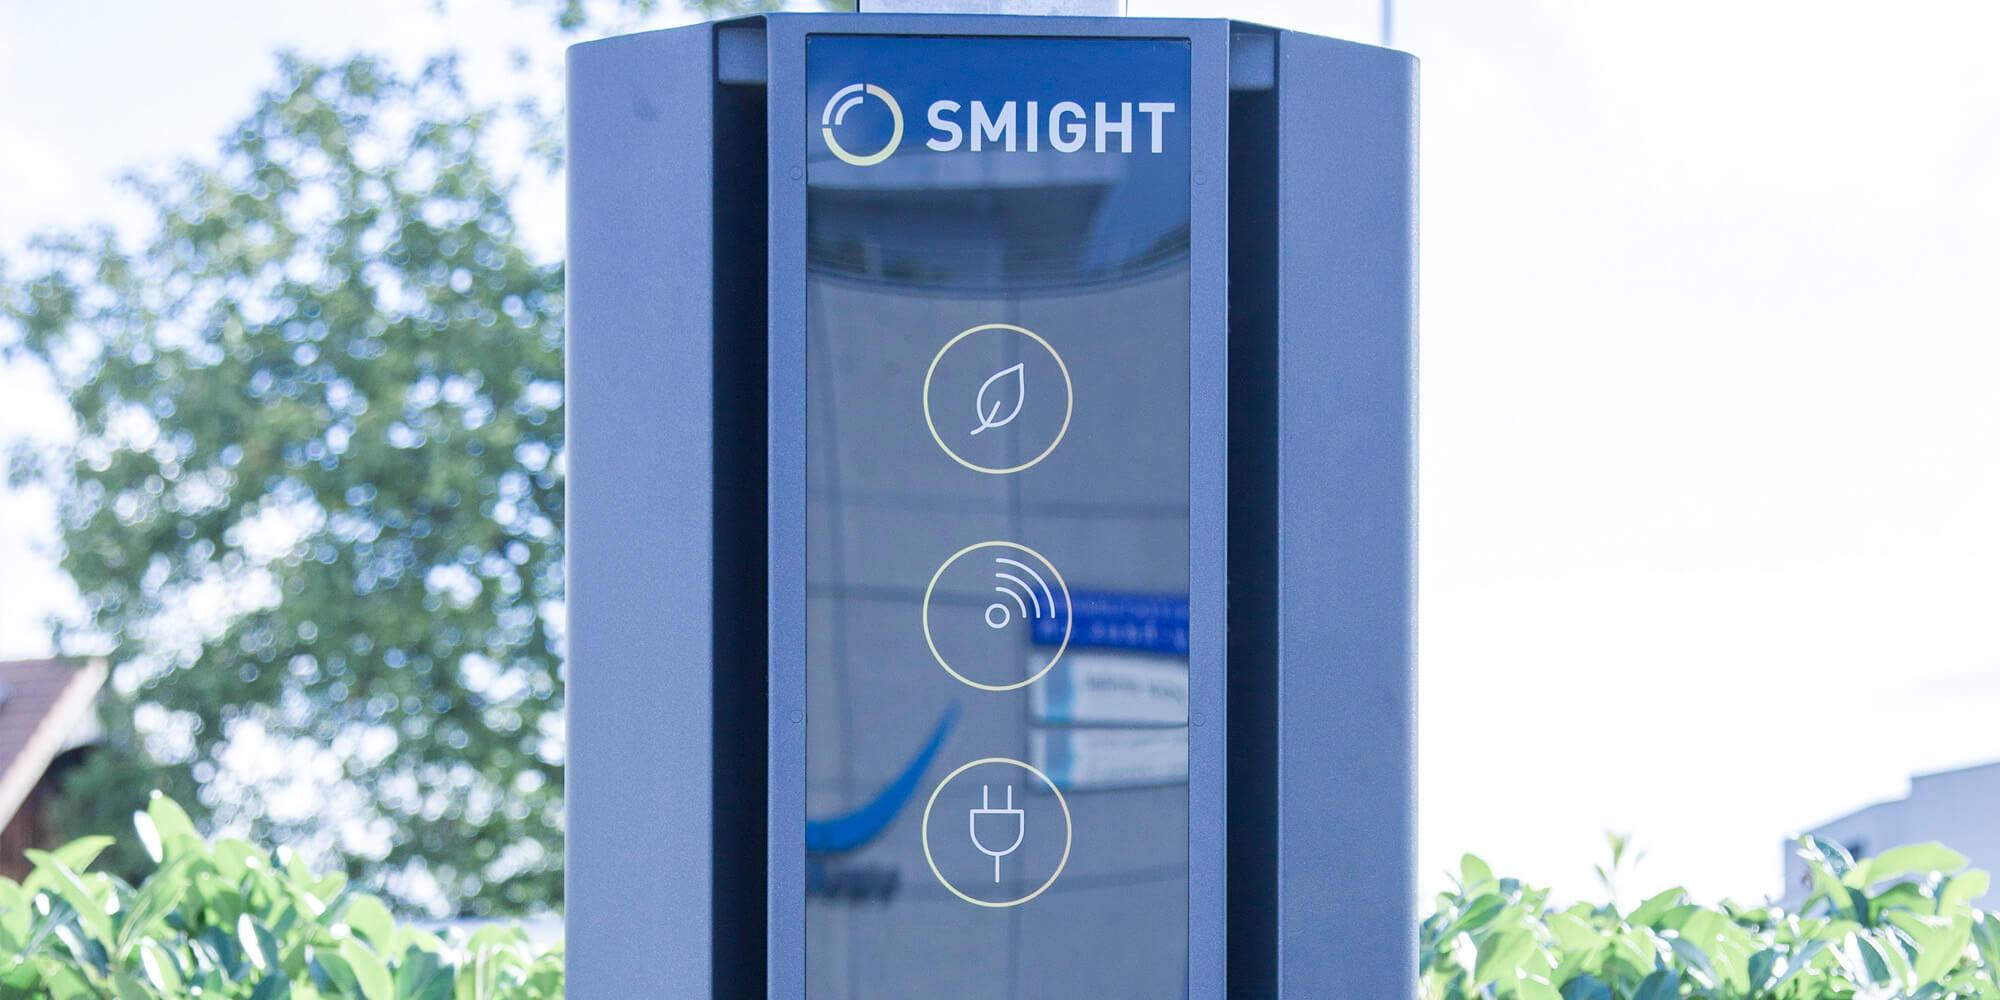 ewh-smart-city-tower